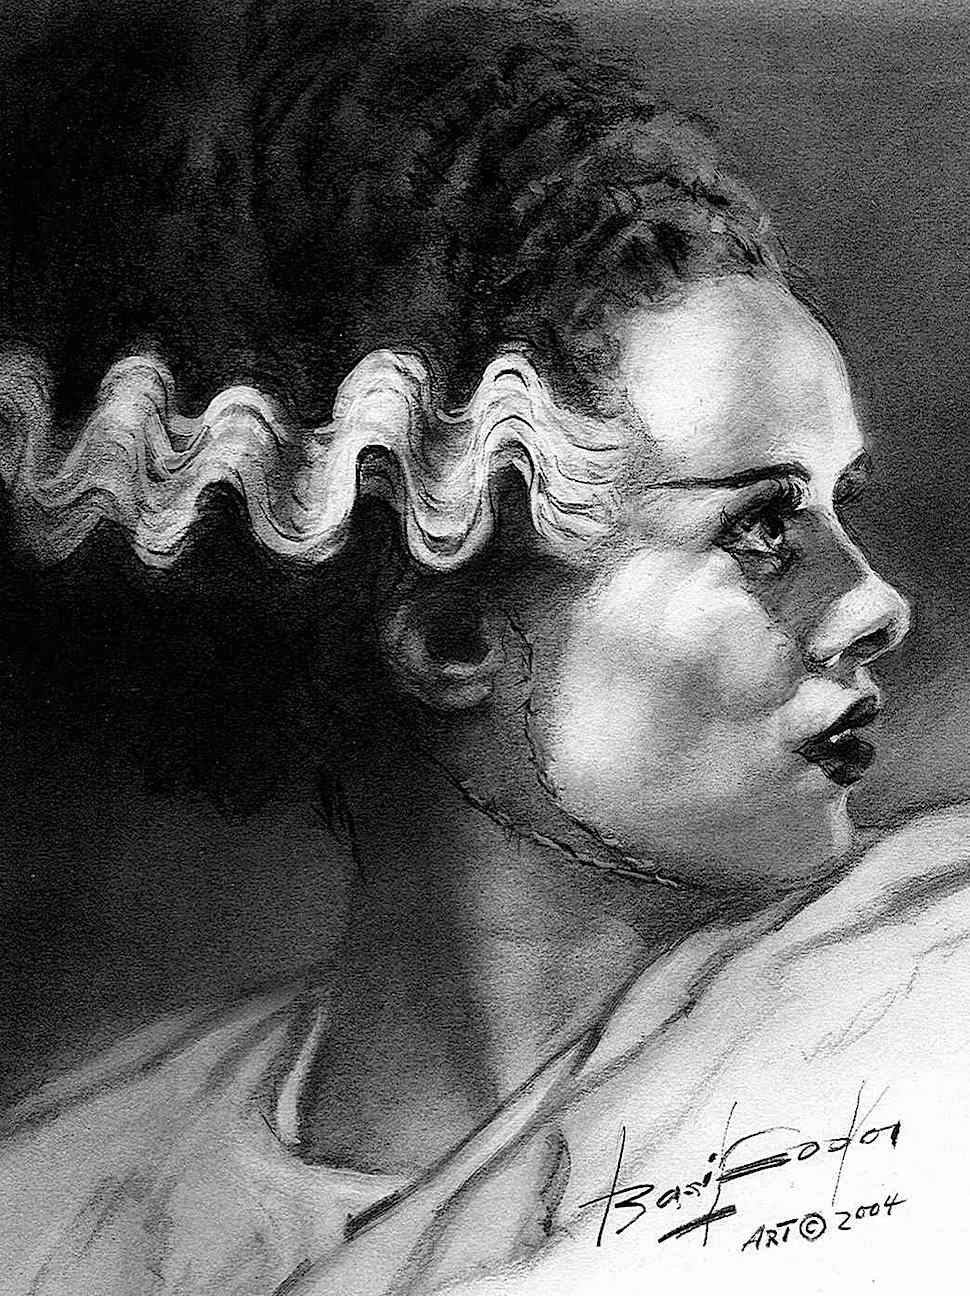 a Basil Gogos illustration of Elsa Lanchester as the Bride Of Frankenstein in 1935